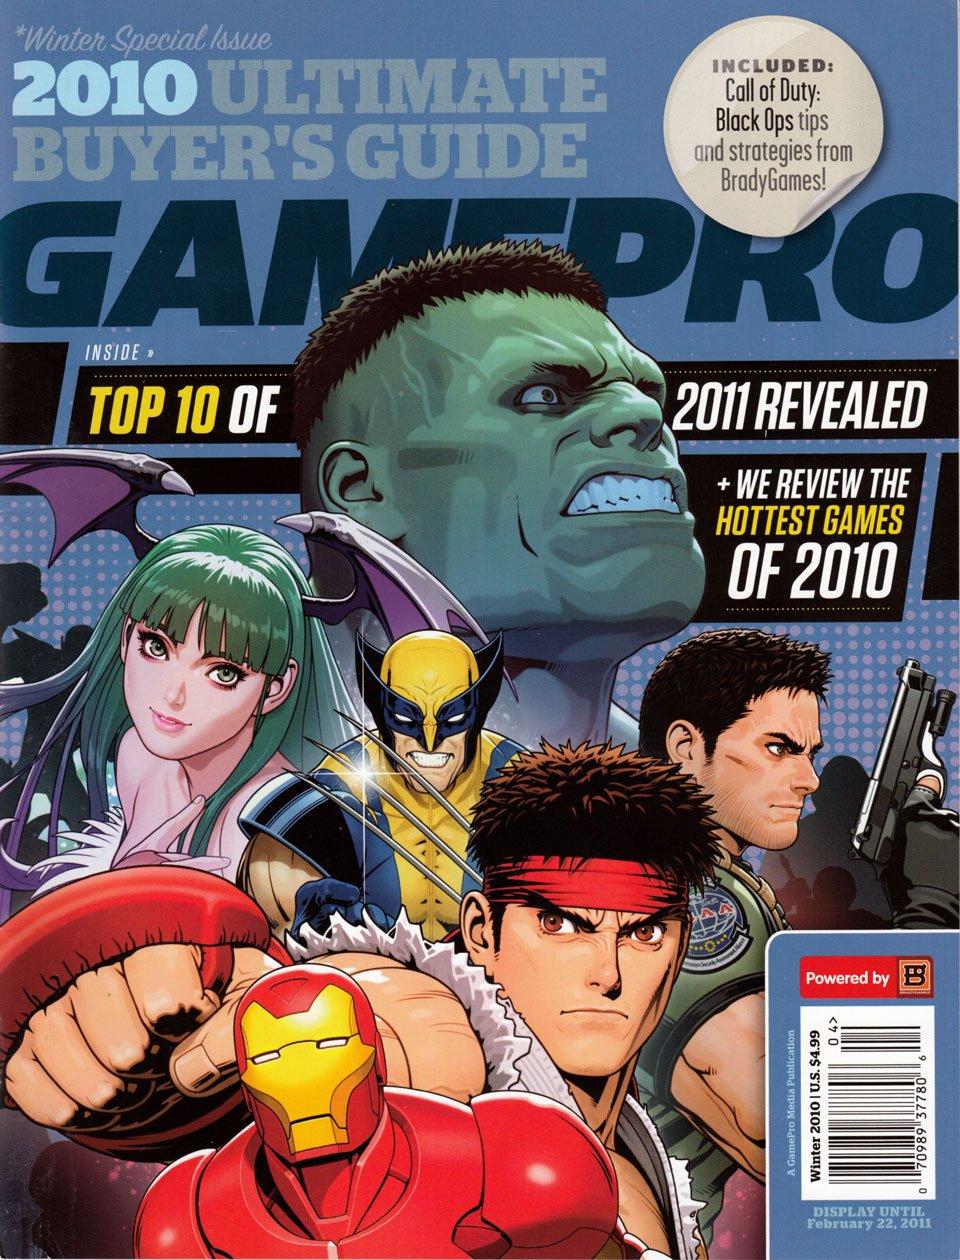 GamePro 2010 Ultimate Buyer's Guide (Winter)